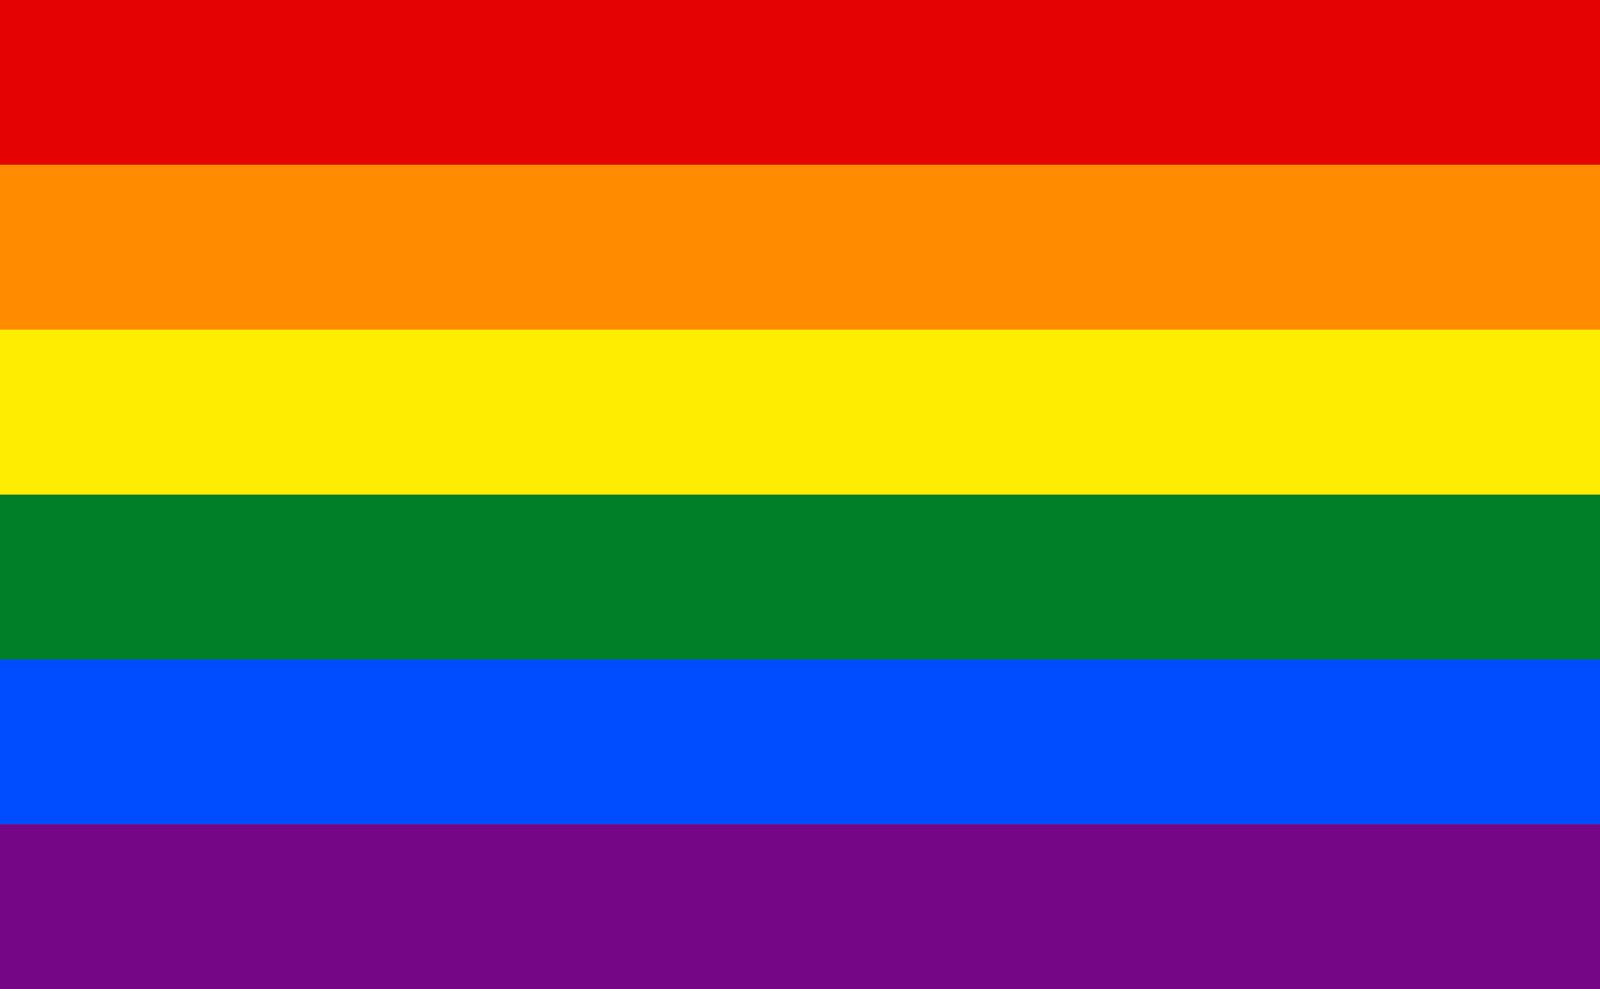 Gay_flag.png